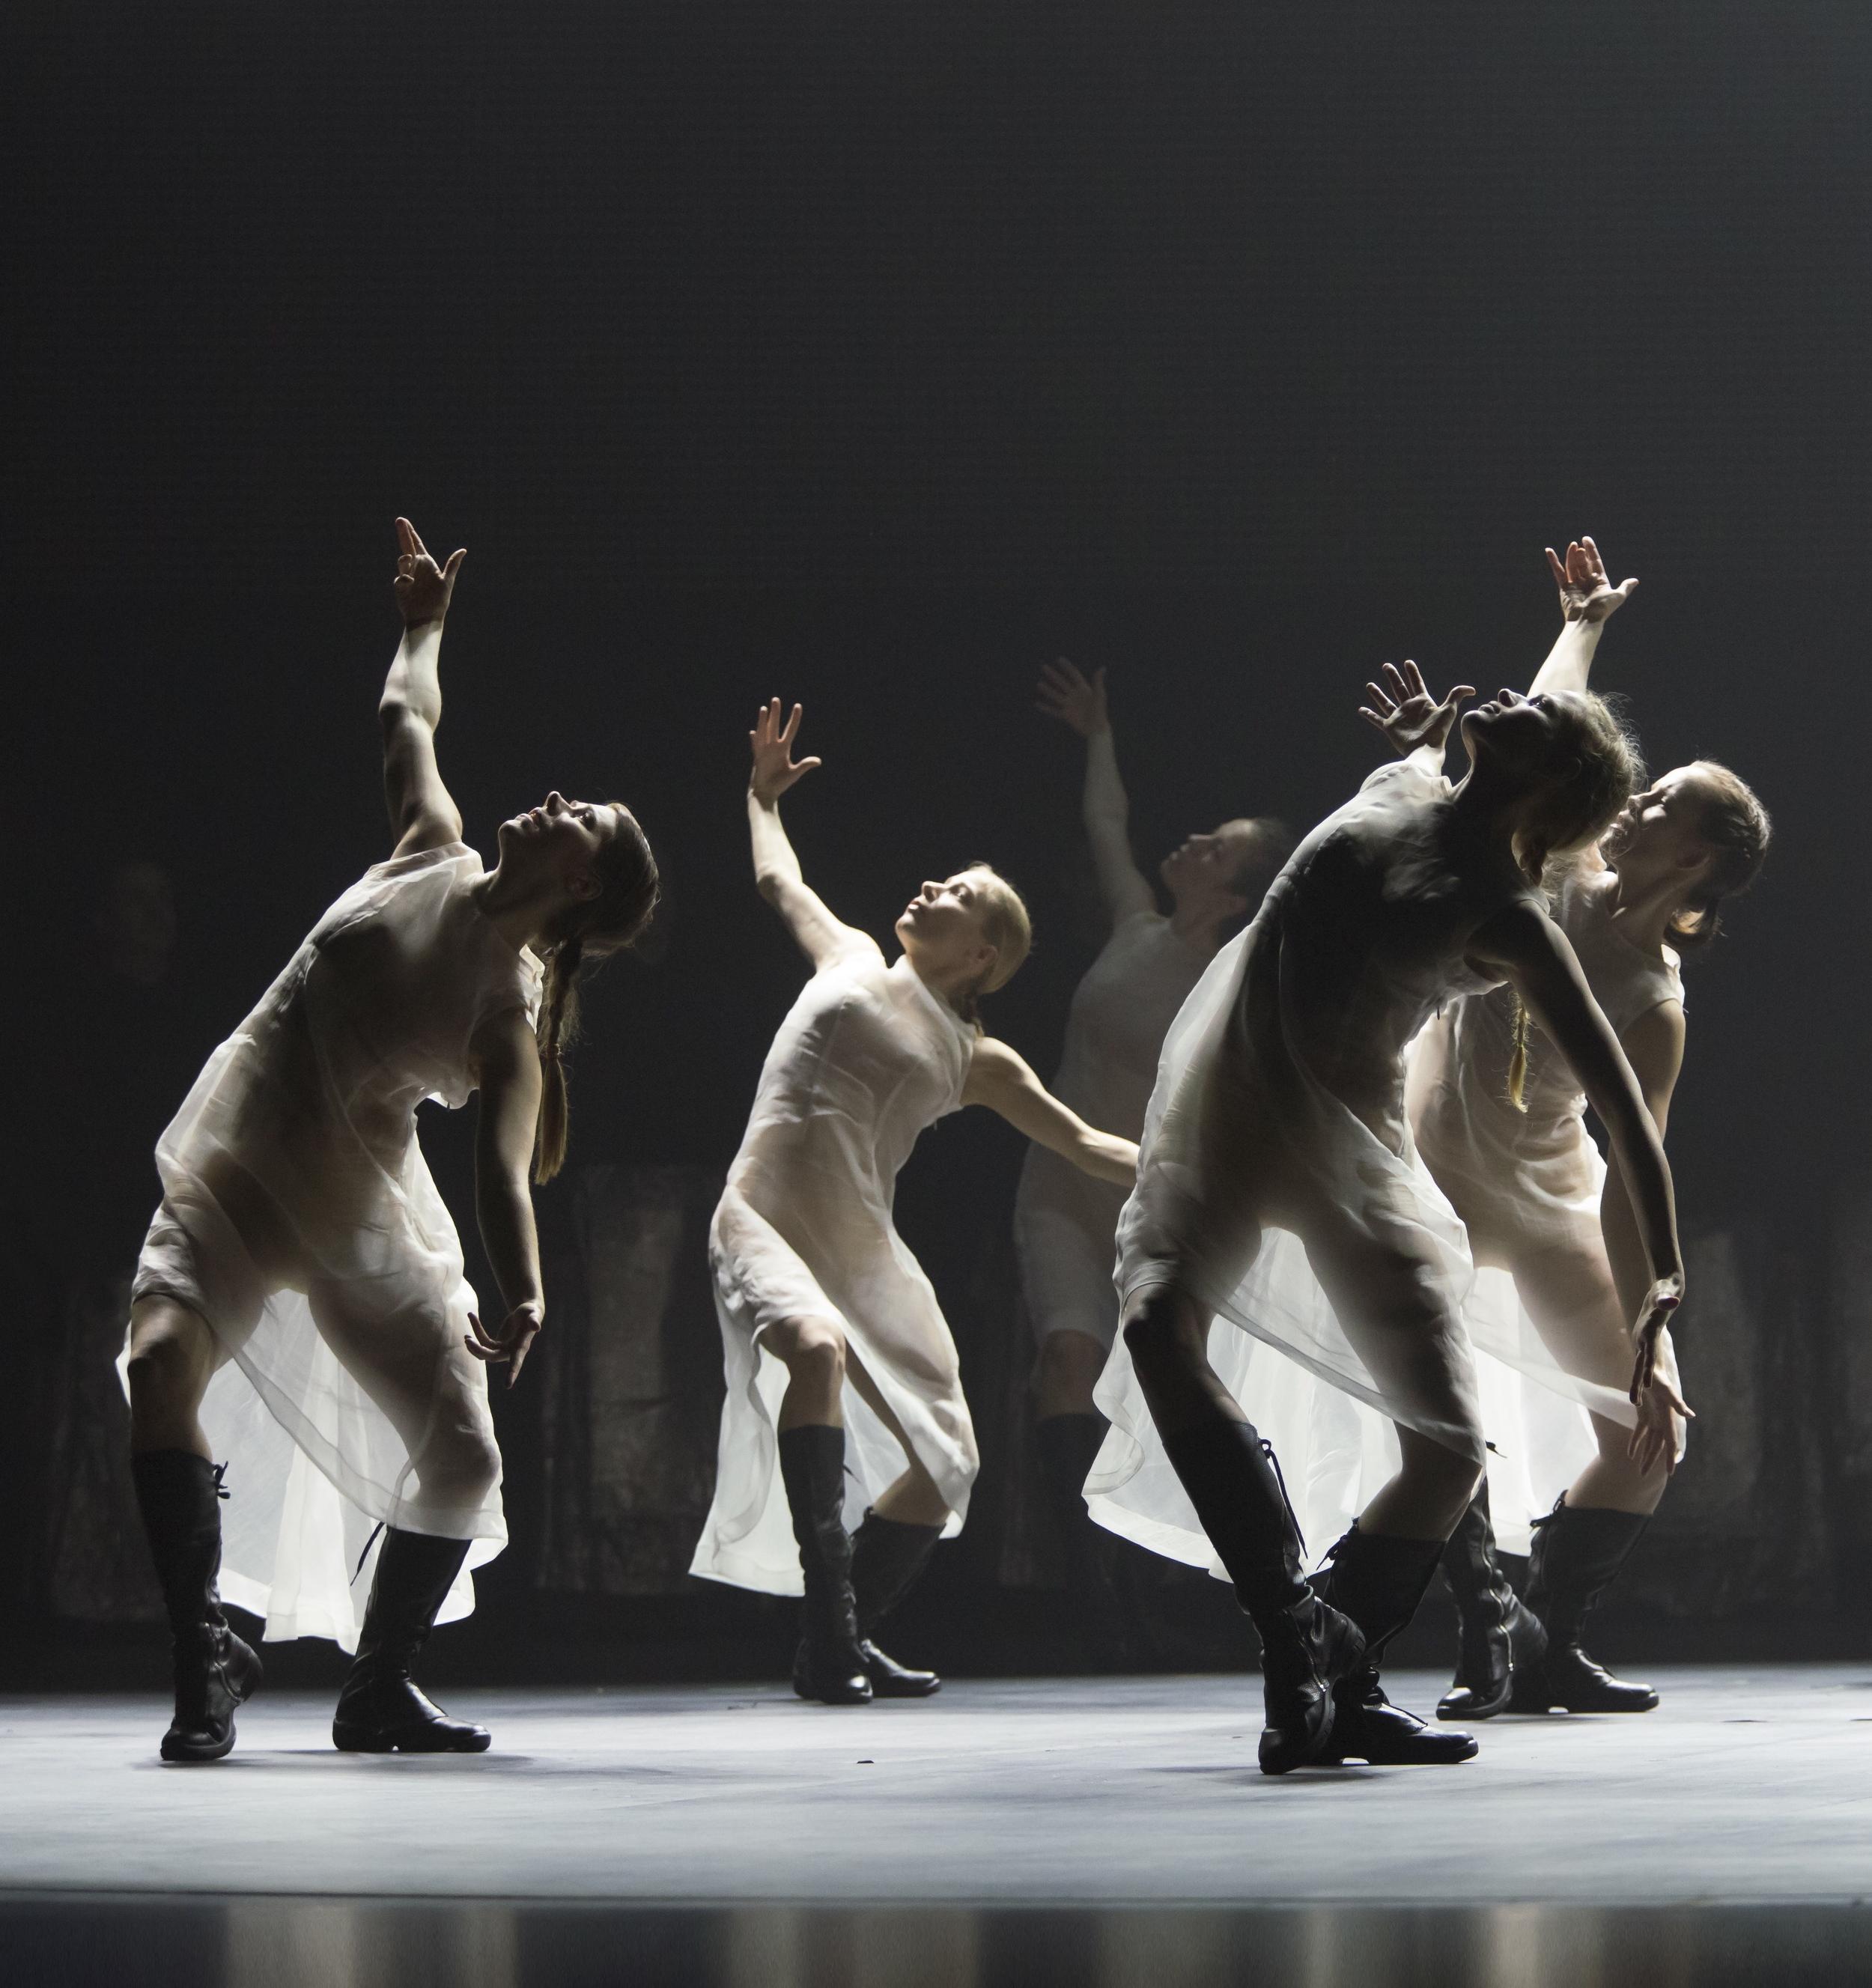 Kullervo ,  chor. Tero Saarinen. Finnish National Opera and Ballet w/ Tero Saarinen Company, 2015. Photo by Sakari Viika/FNO